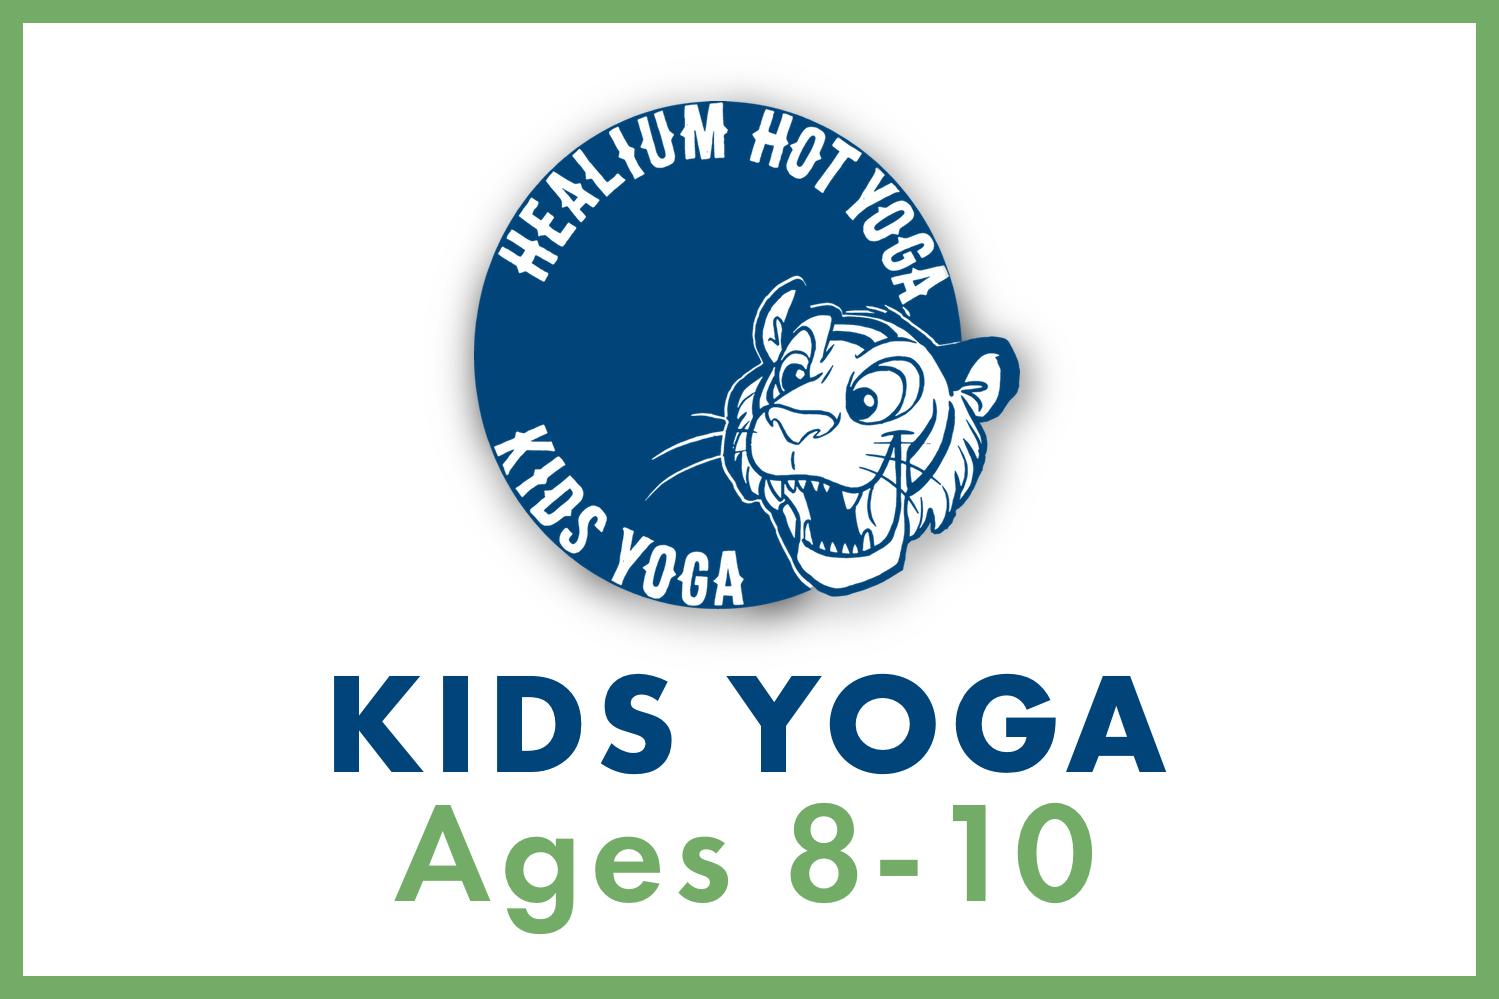 Kids_8-10_HHY_Web.png